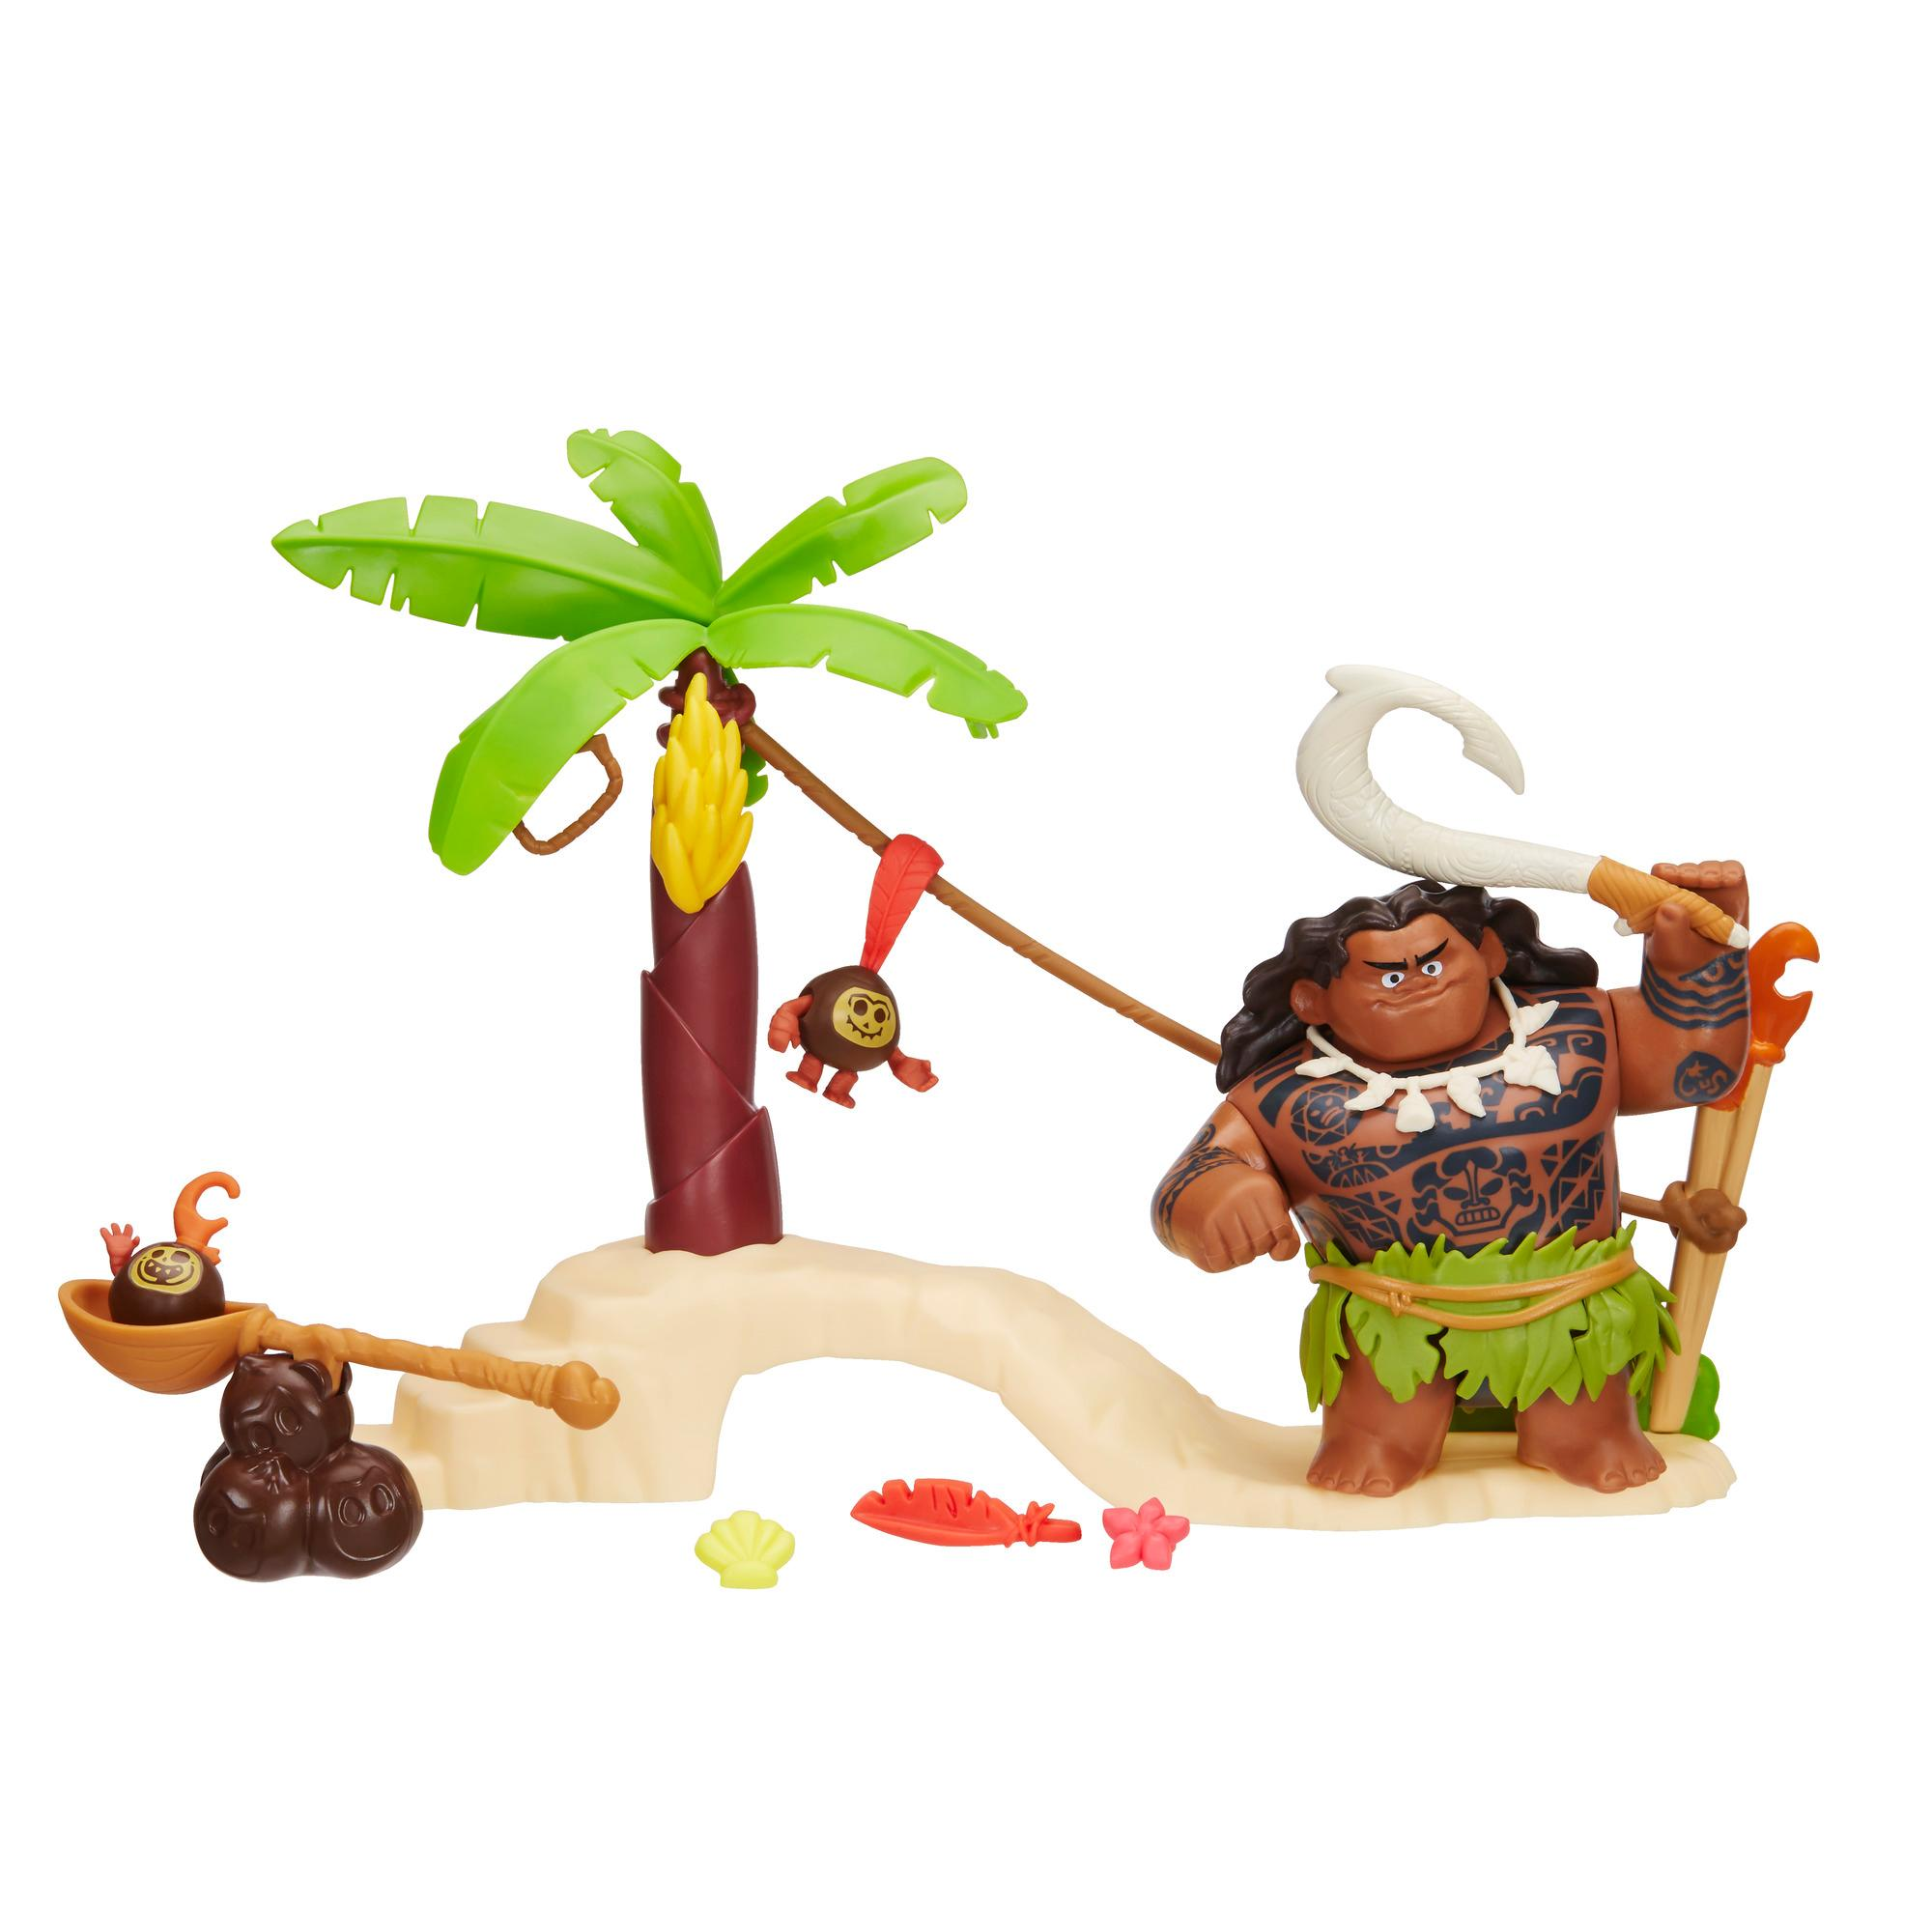 Conjunto Mini Moana Com Barco E Amigos - Praia